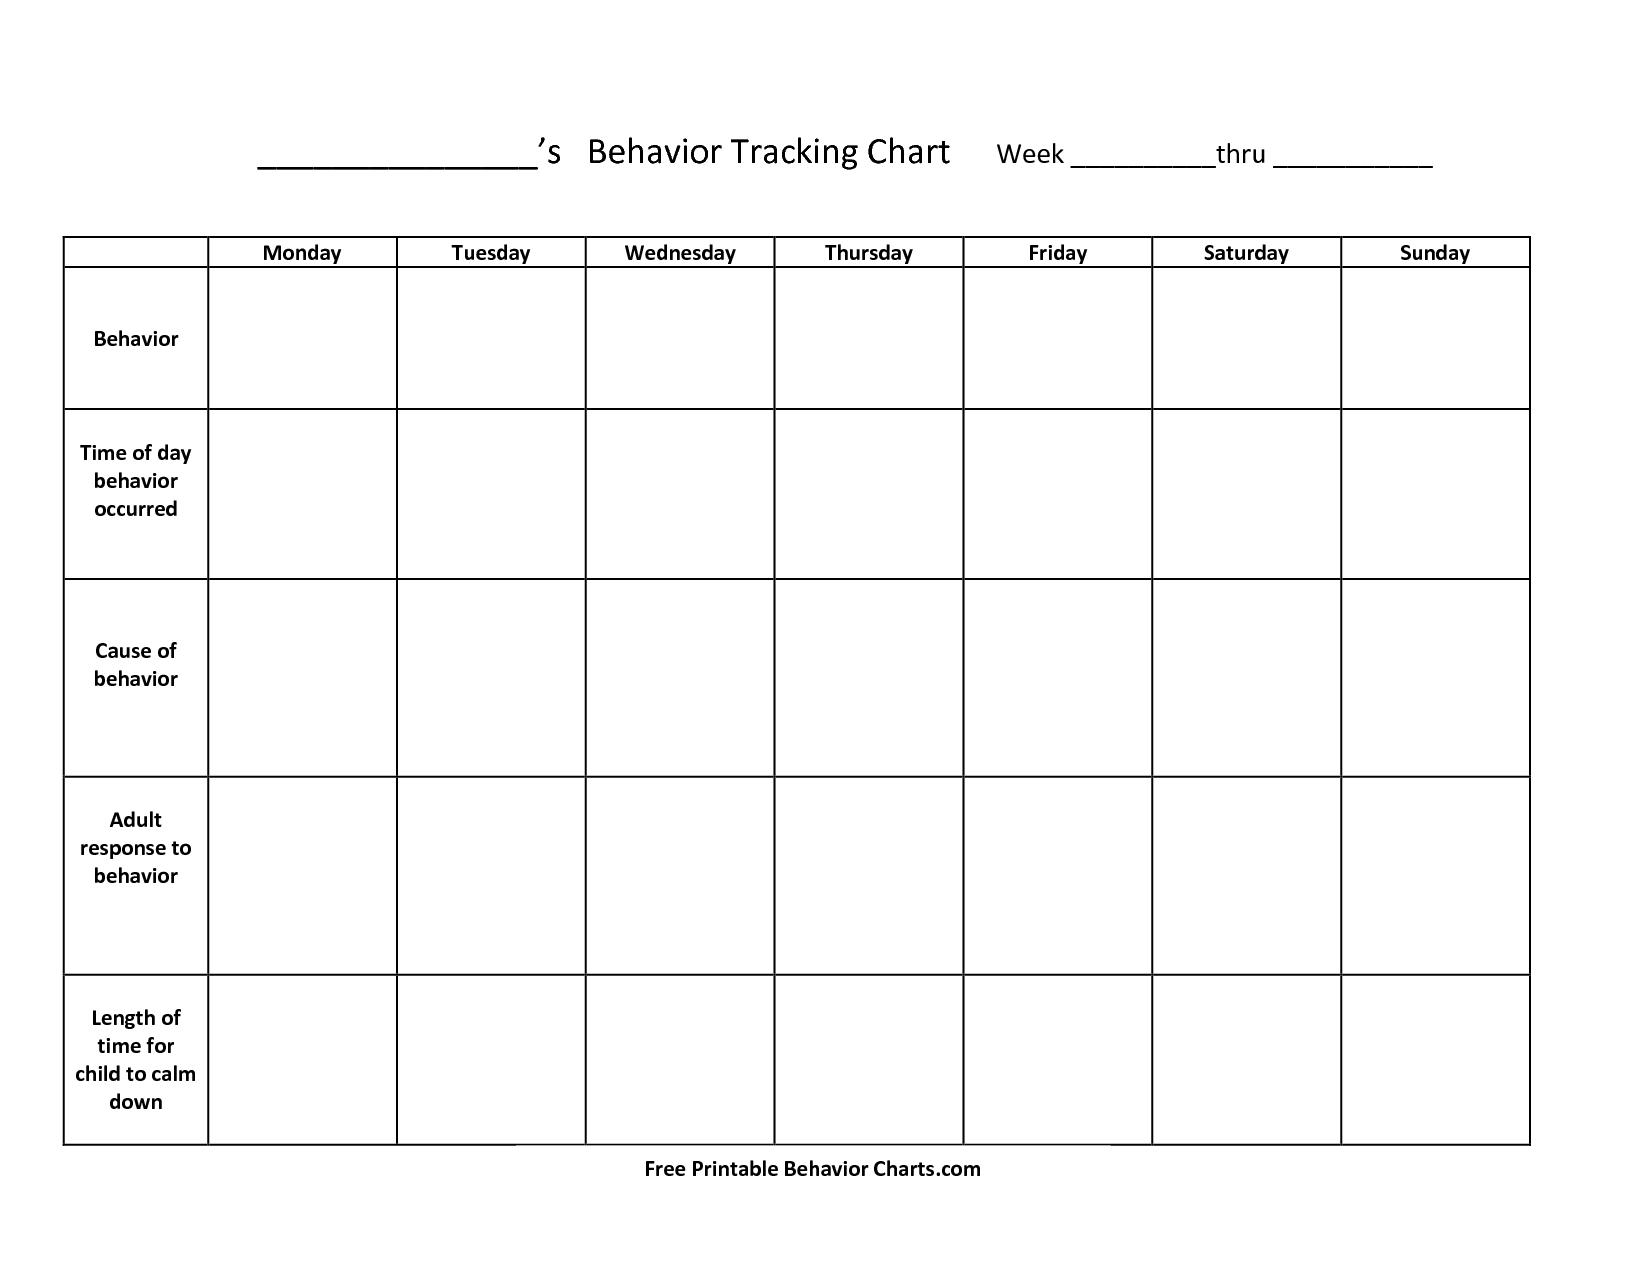 Free+Printable+Behavior+Charts+For+Teachers   Things To Try - Free Printable Incentive Charts For Teachers